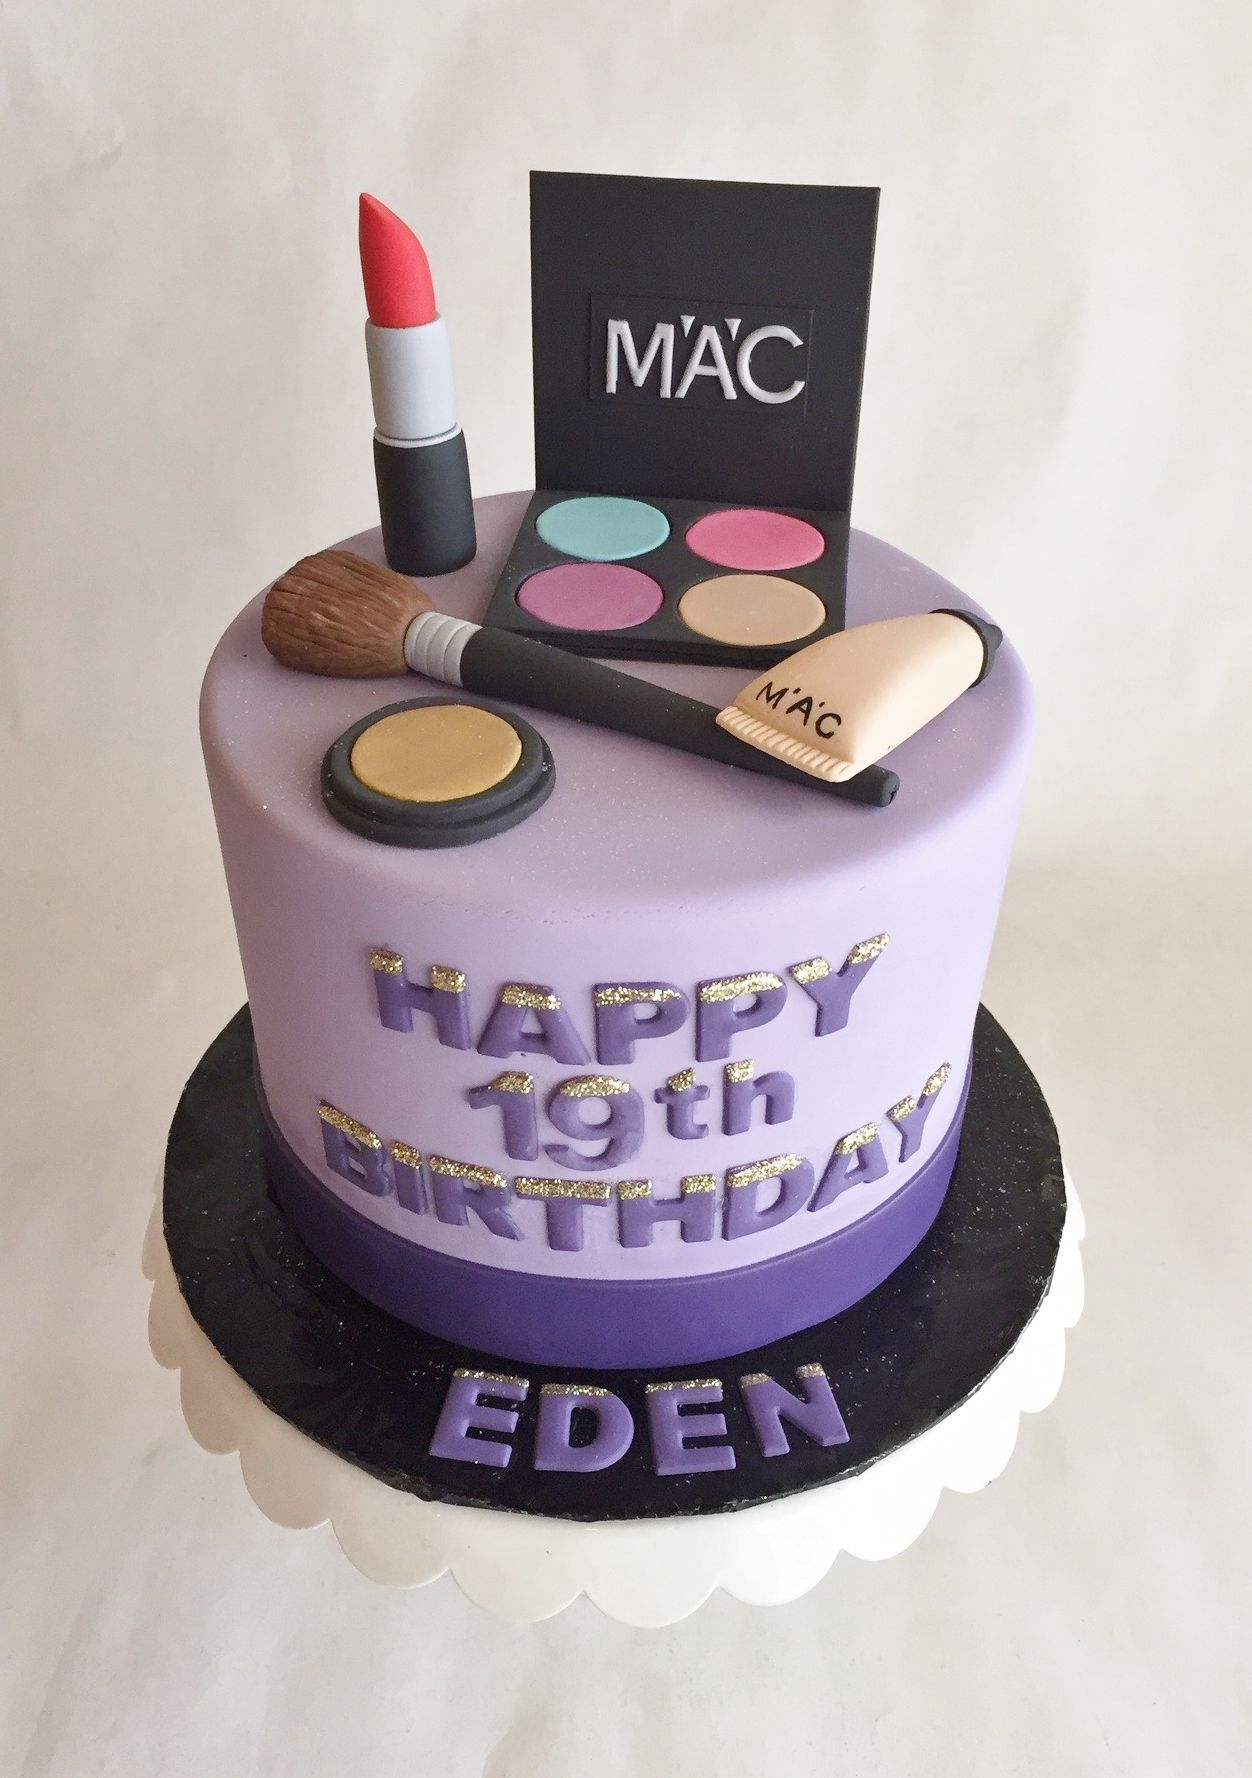 Mac Makeup Cake Birthday Cake Mac Eyeshadow Lipstick